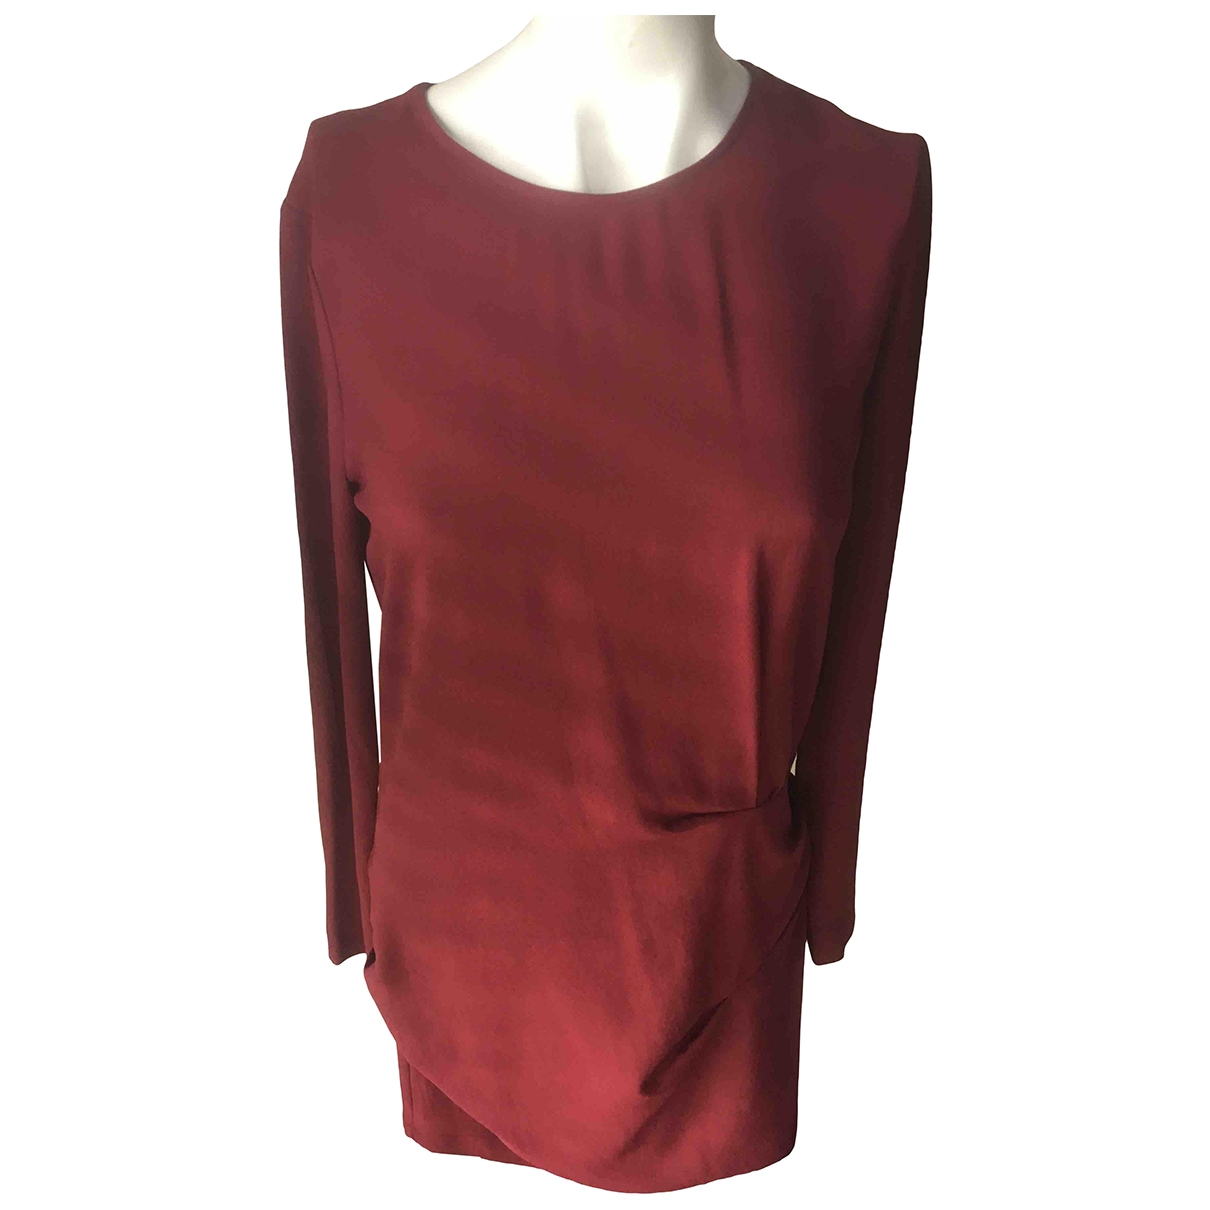 Iro \N Kleid in  Bordeauxrot Polyester